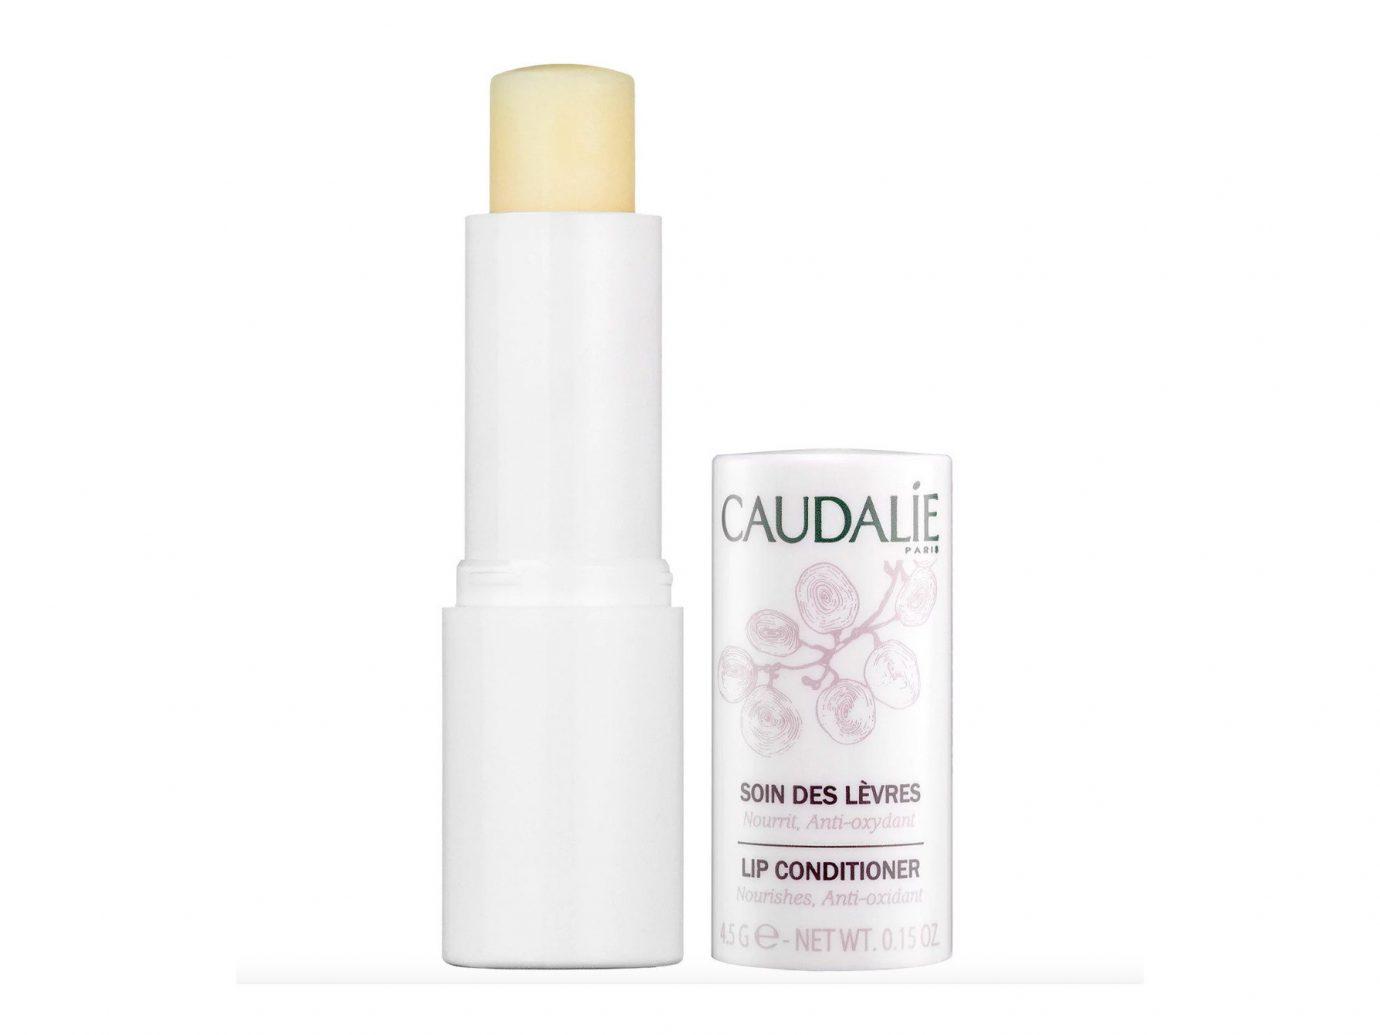 Health + Wellness Style + Design Travel Shop toiletry product skin care lotion cosmetics cream liquid health & beauty perfume